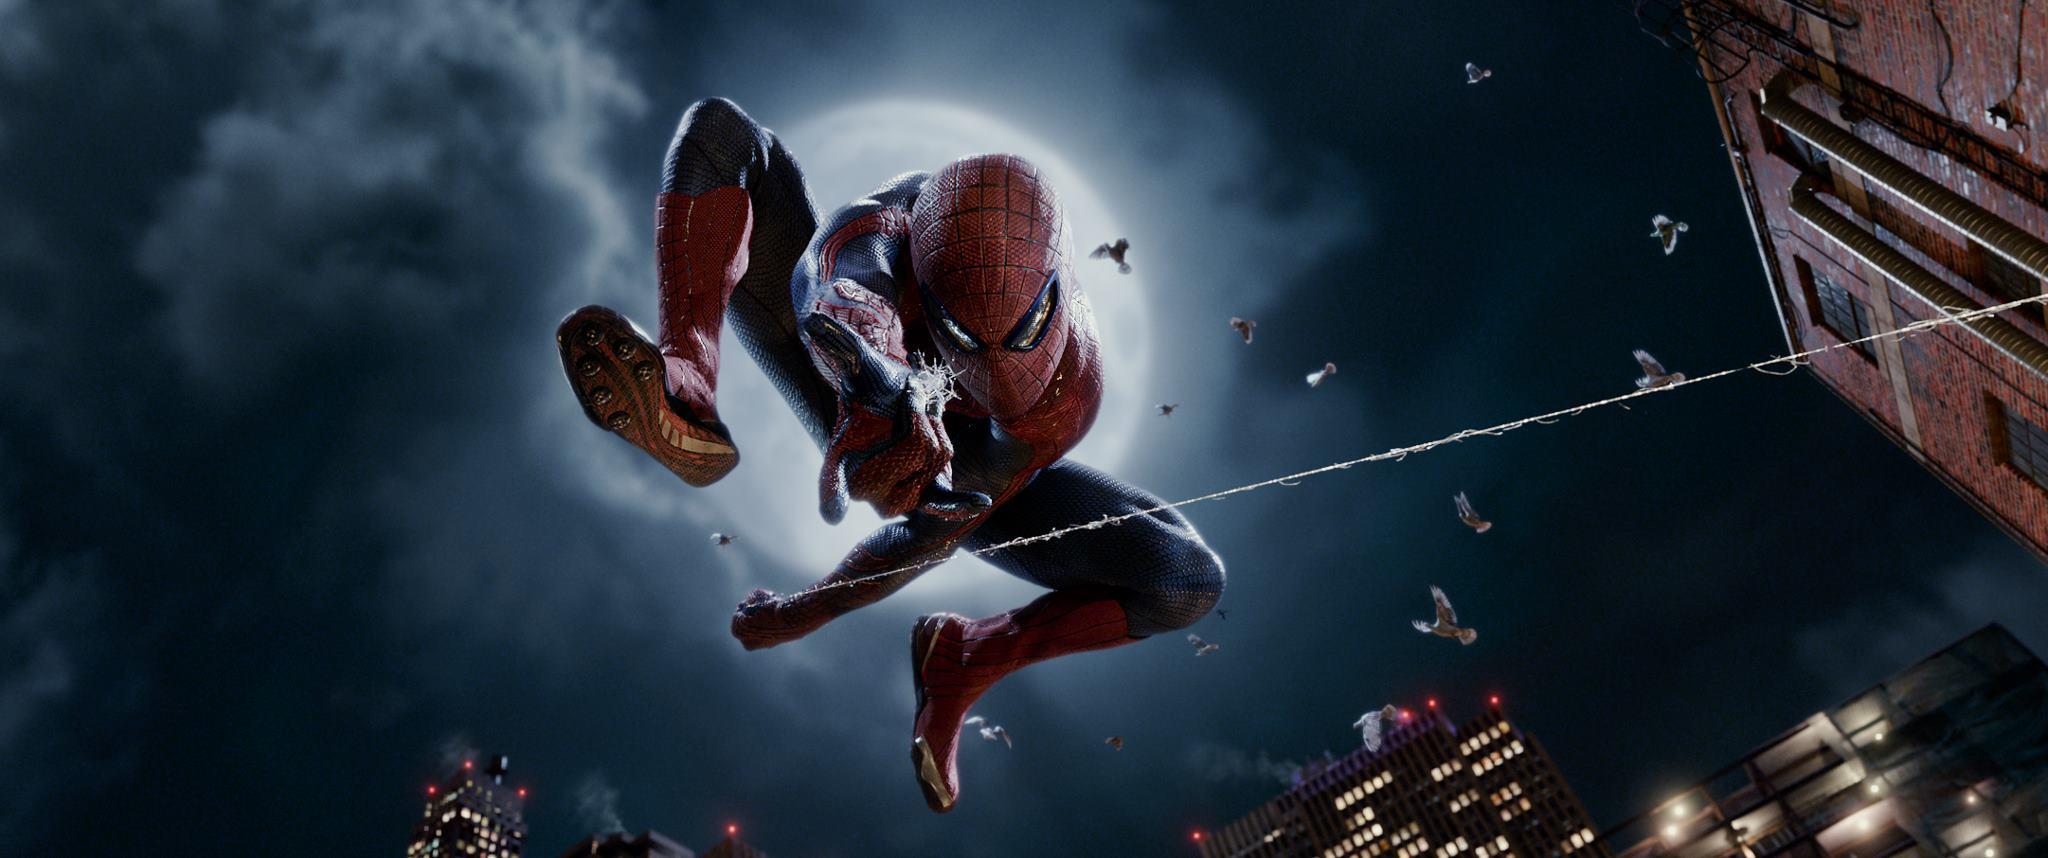 The Amazing Spider Man [2012] Farrows 360 2048x858